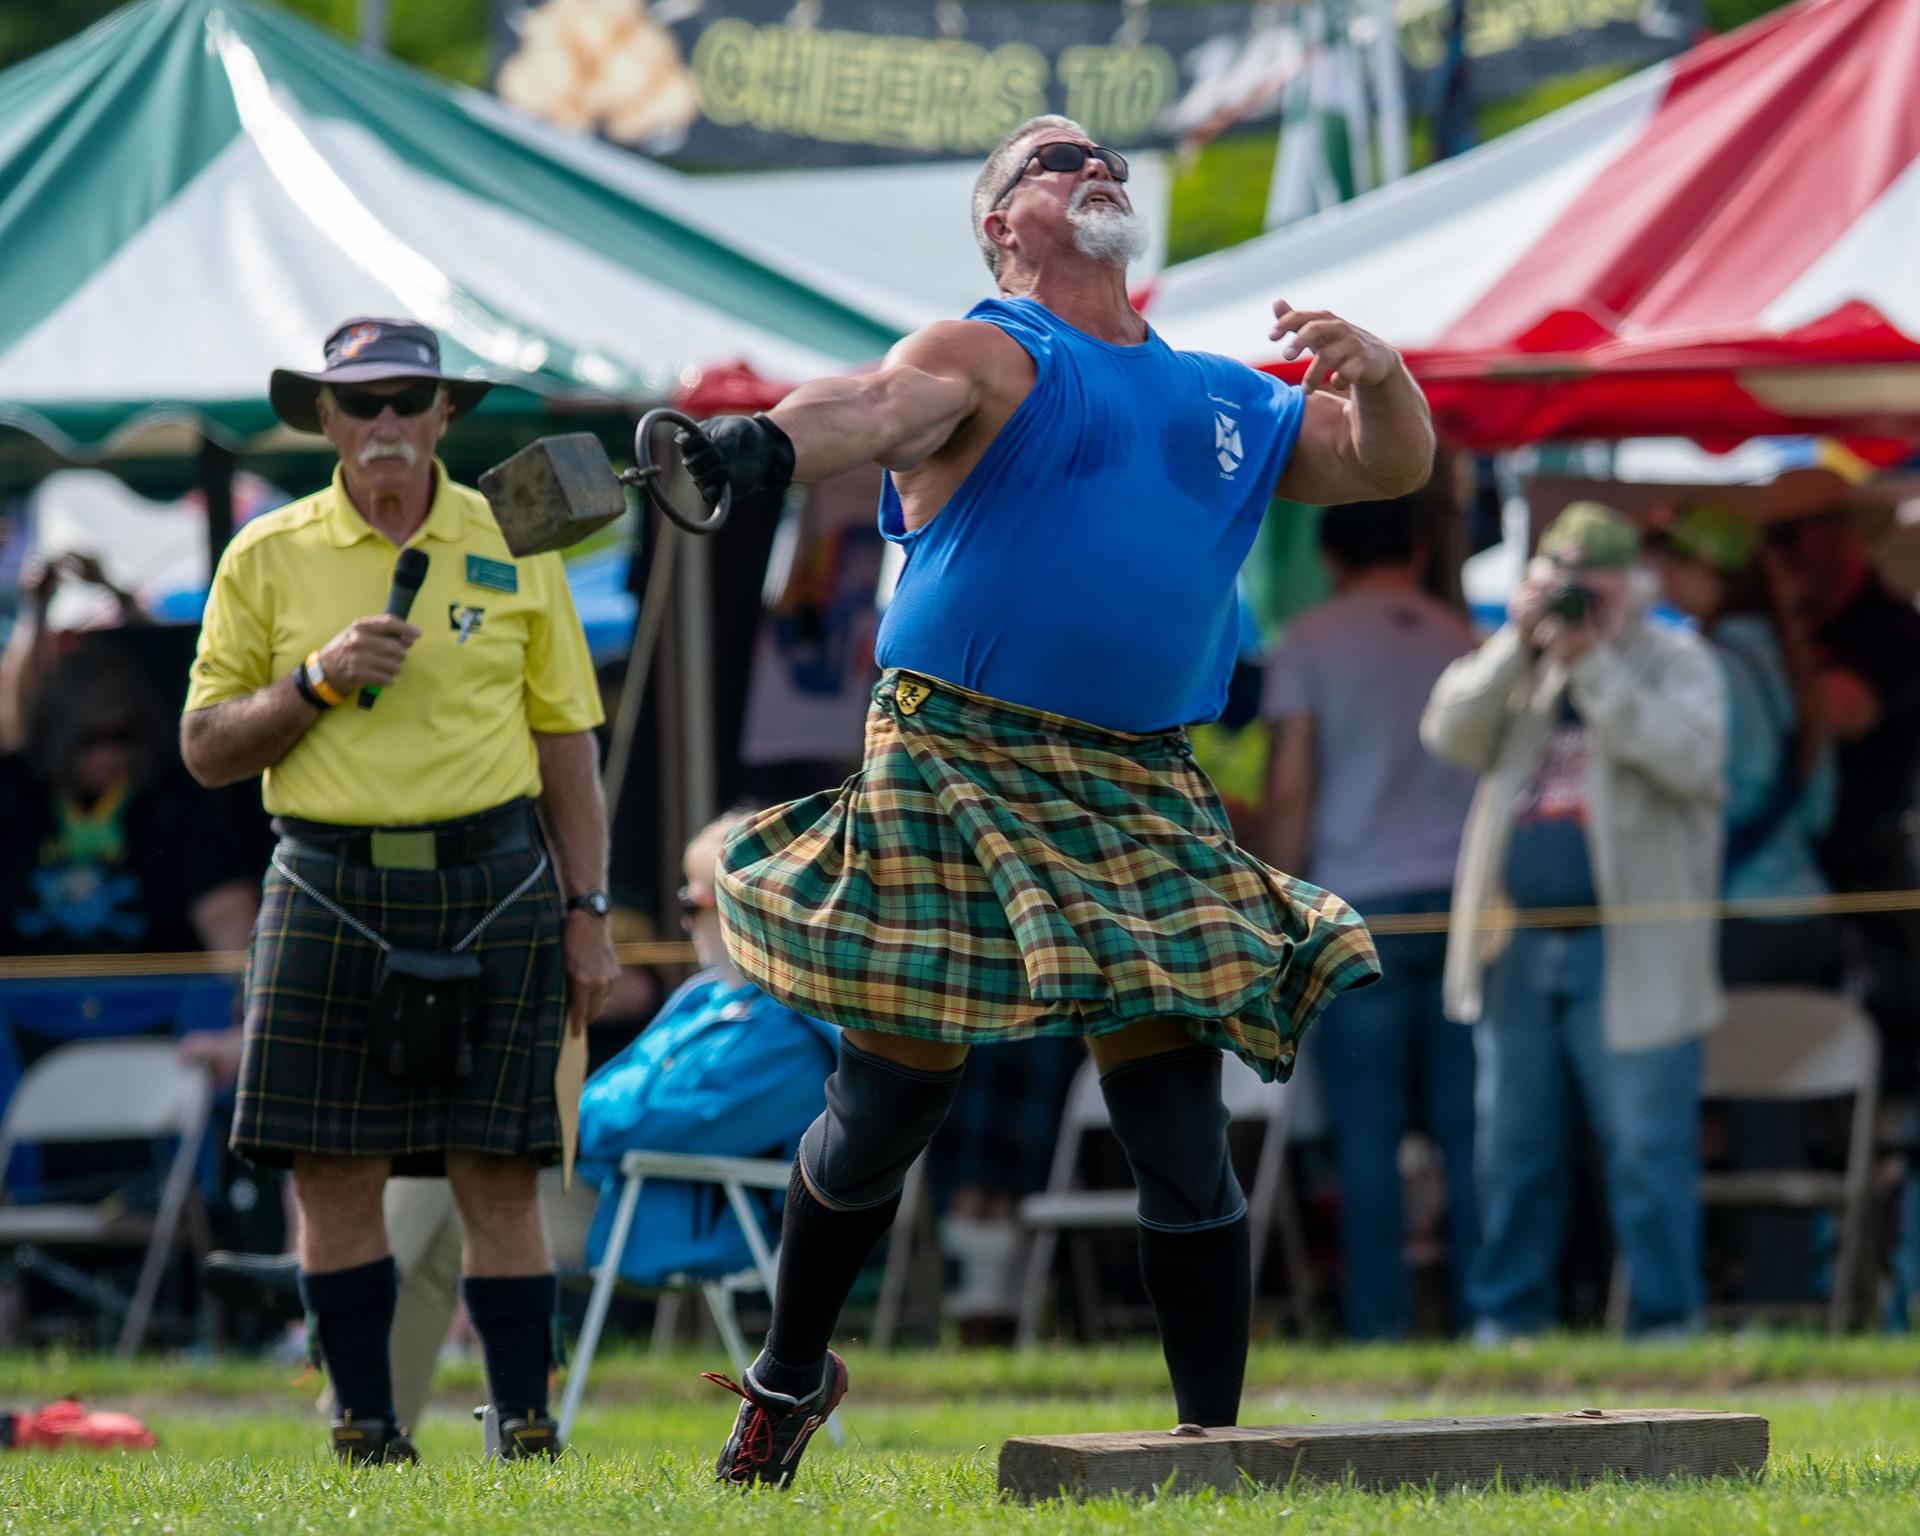 John 'The Mountain' Van Deusen rises above competition at Highland Games